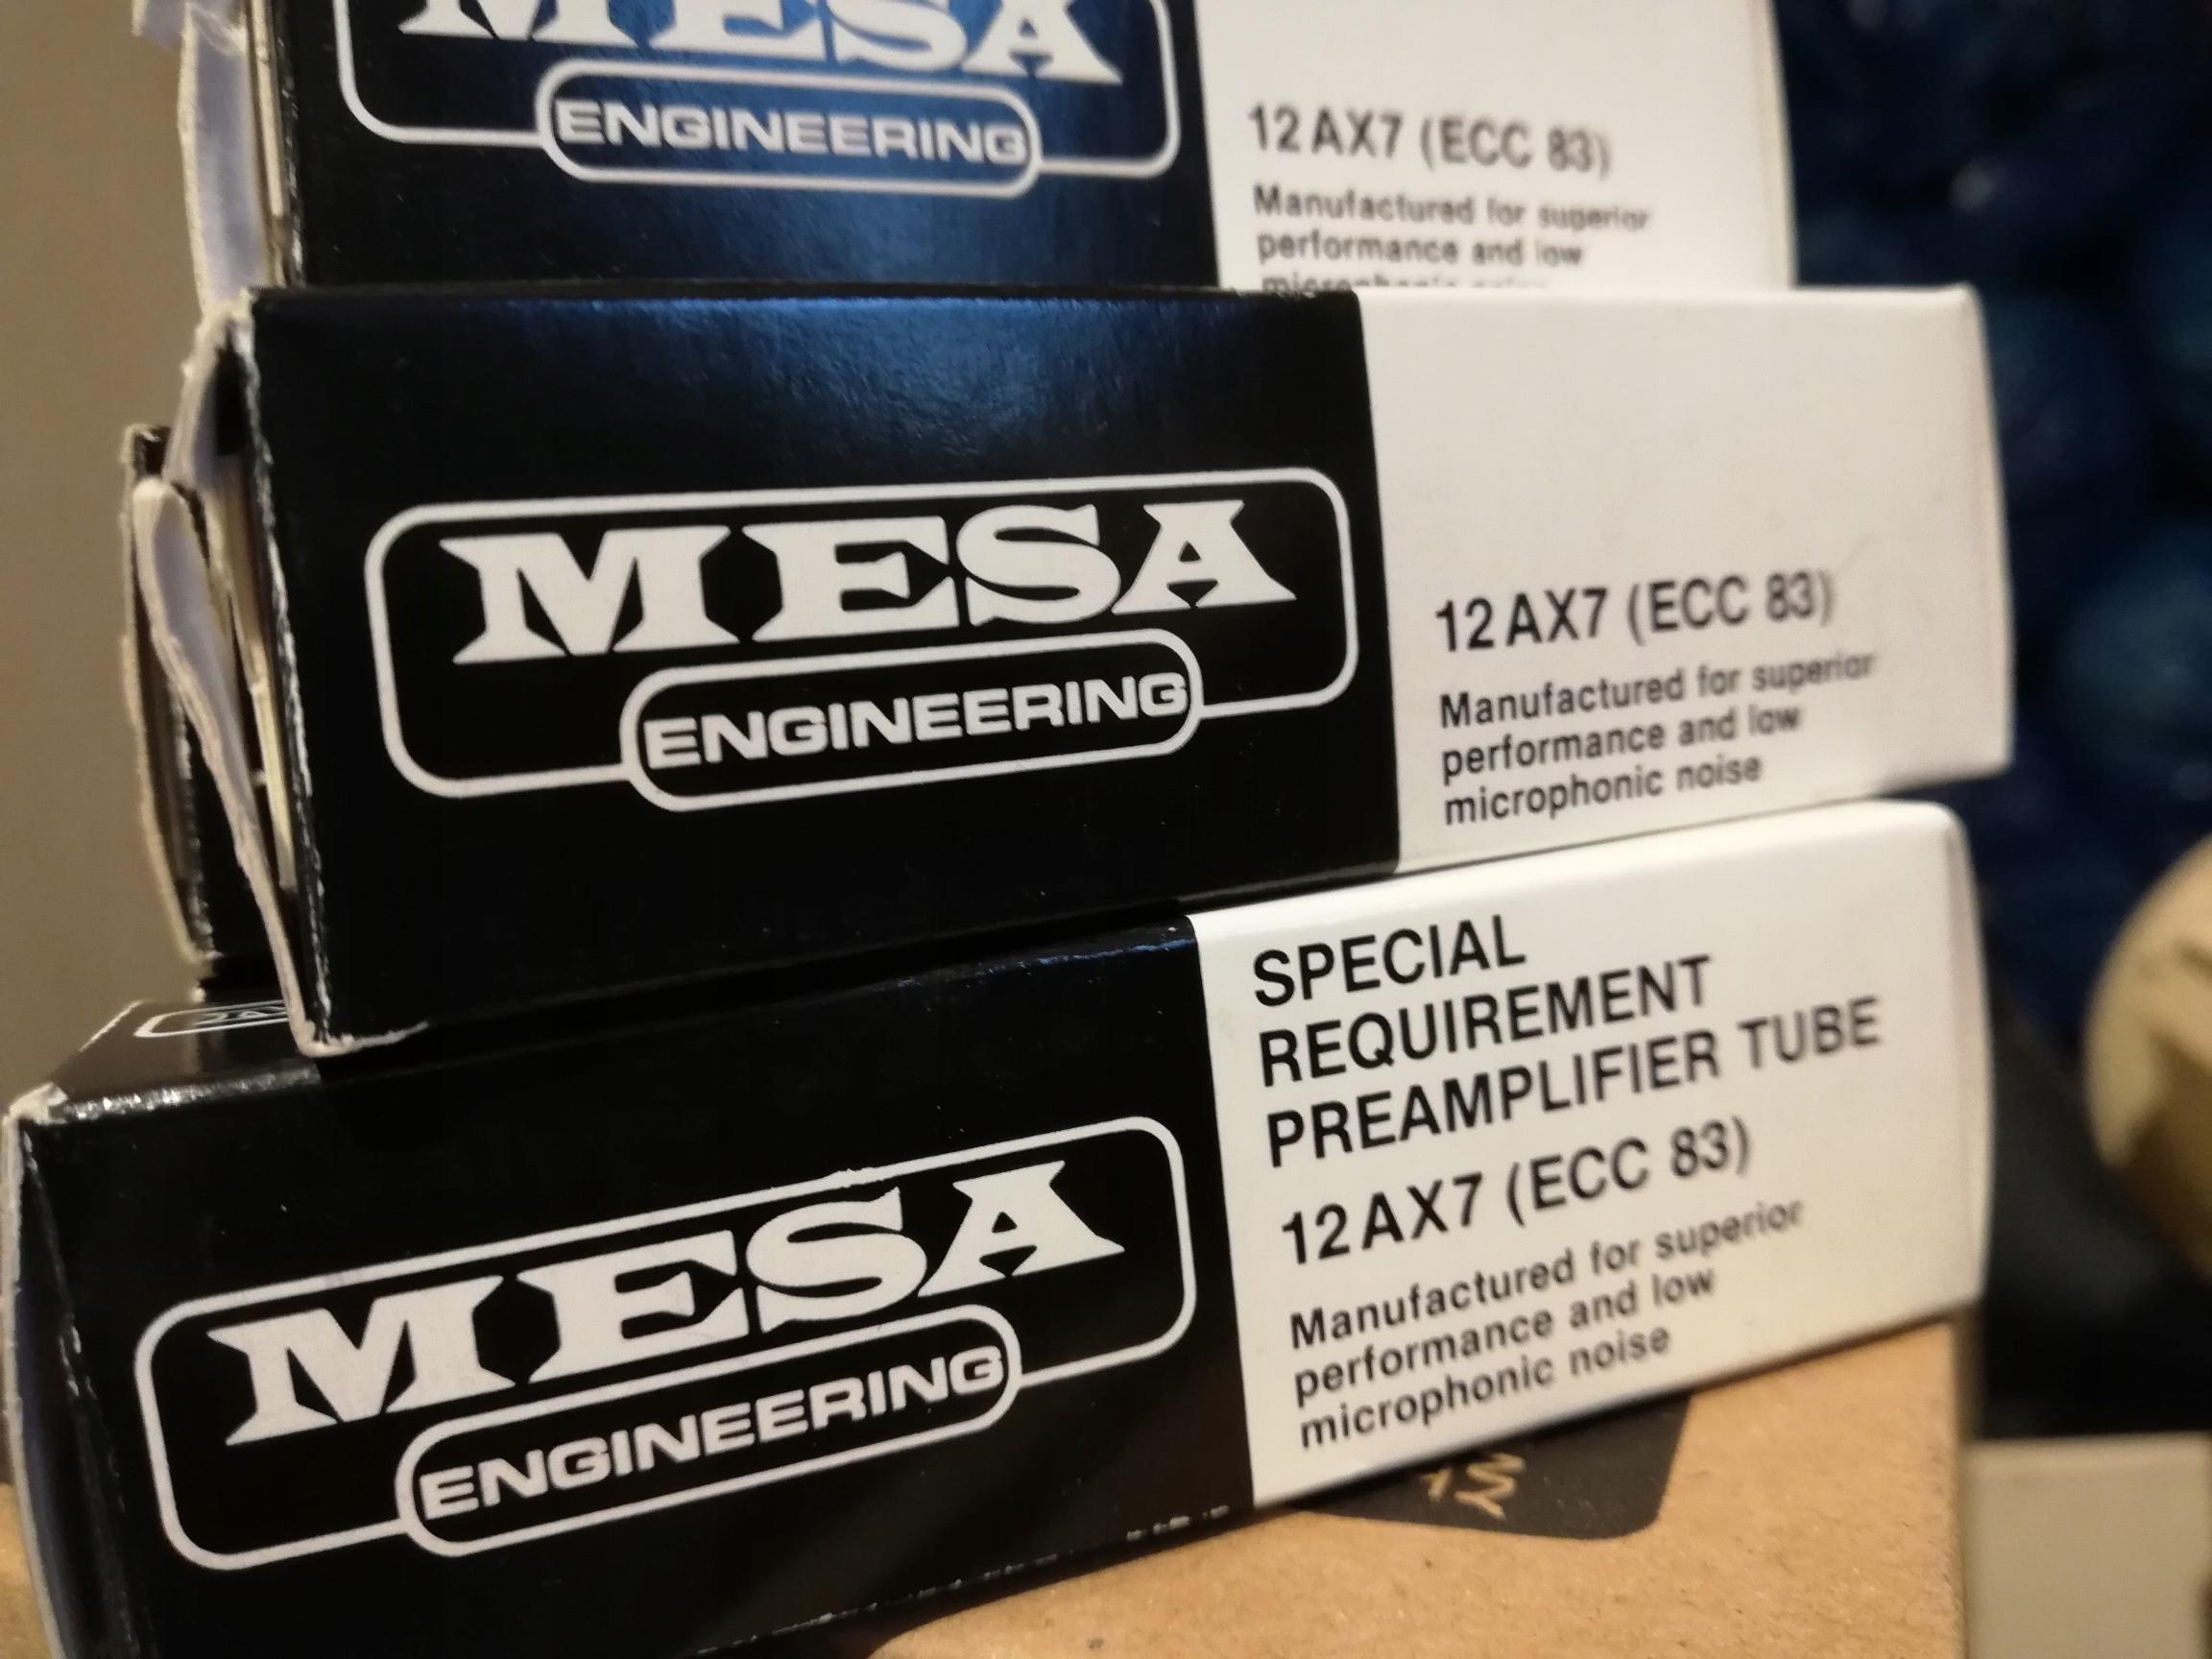 Mesa 12AX7(ECC 83)